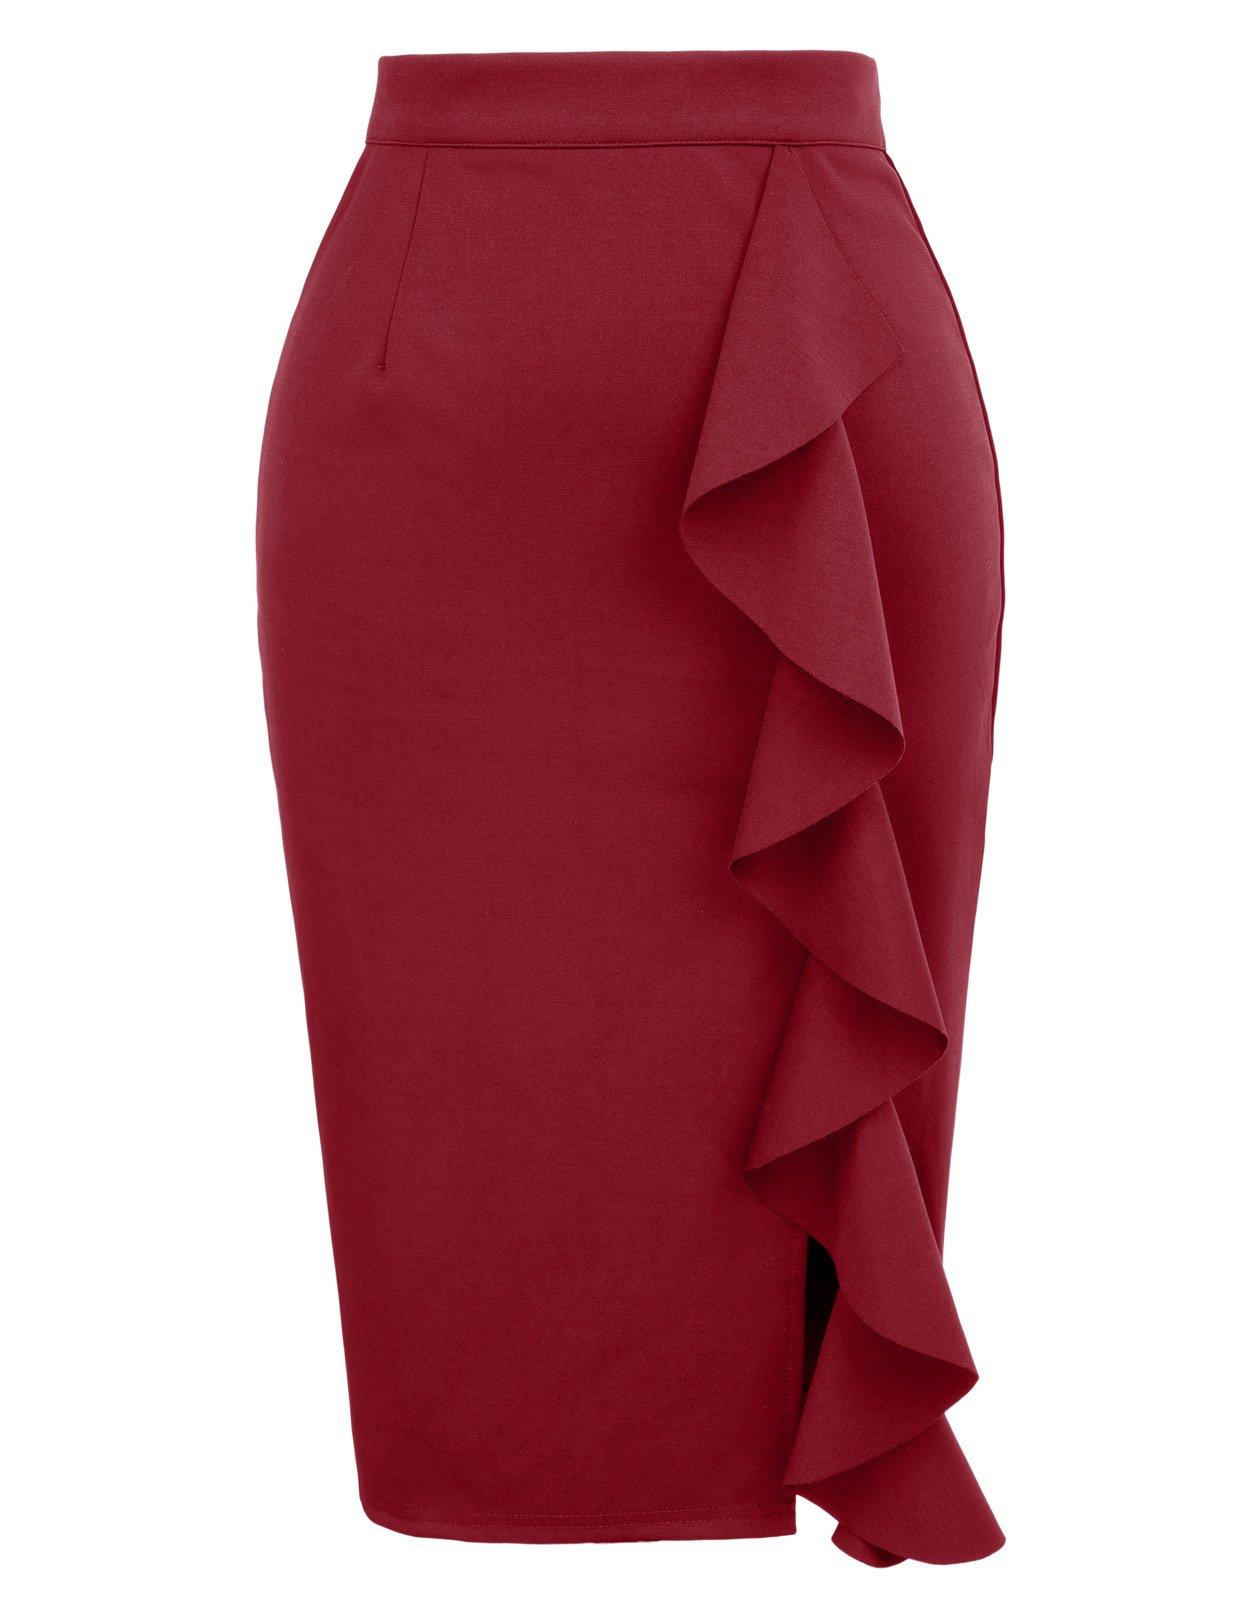 68b75379a03 Get Quotations · GRACE KARIN Women s Ruffle Bodycon Knee Length Midi Pencil  Skirt